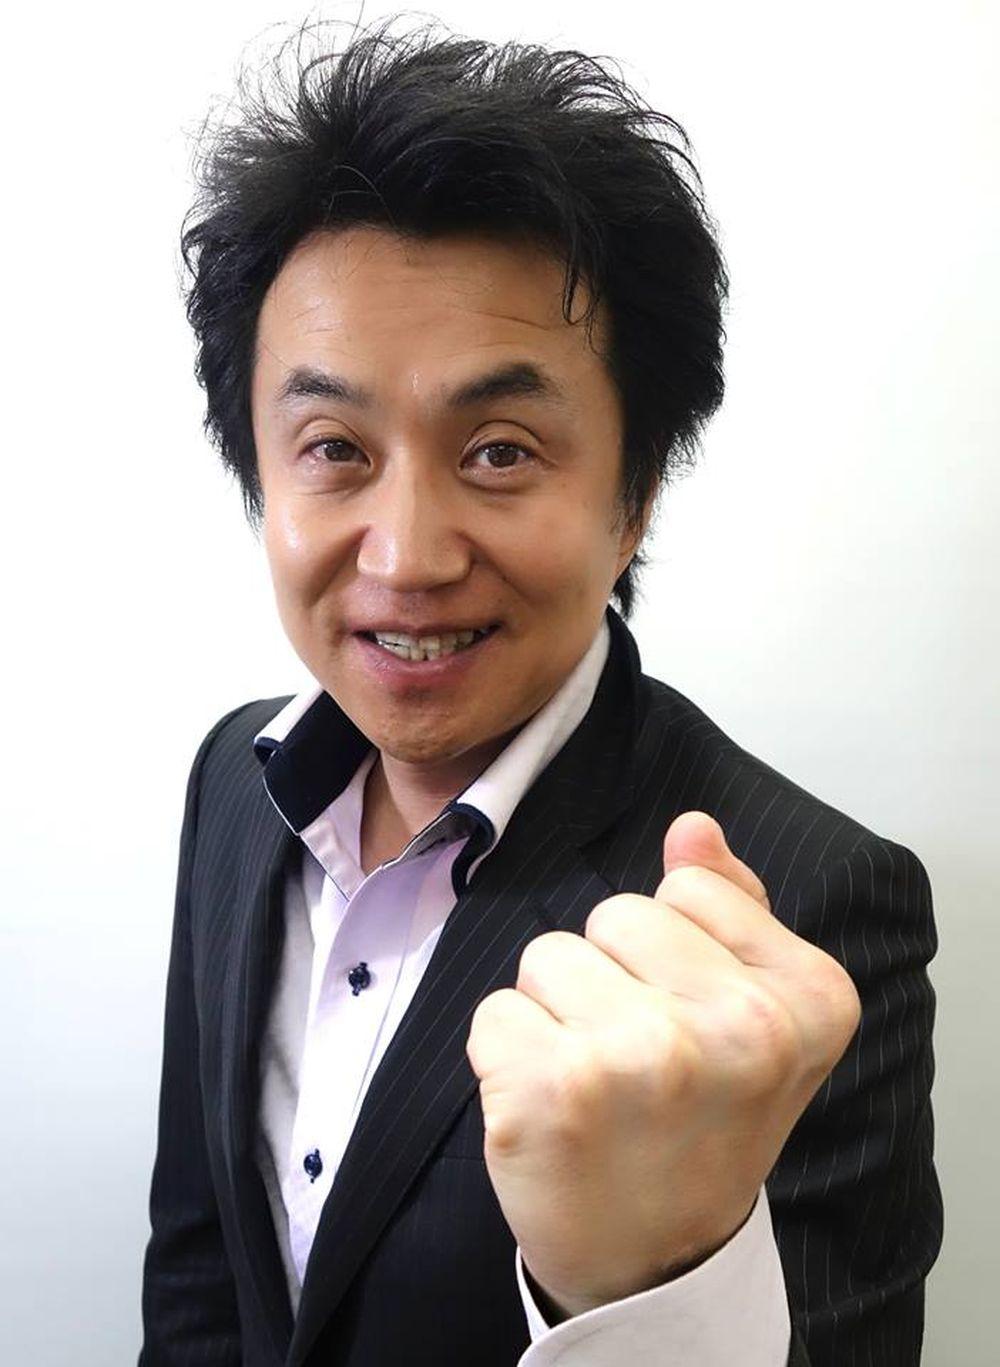 sir yasukochi_04